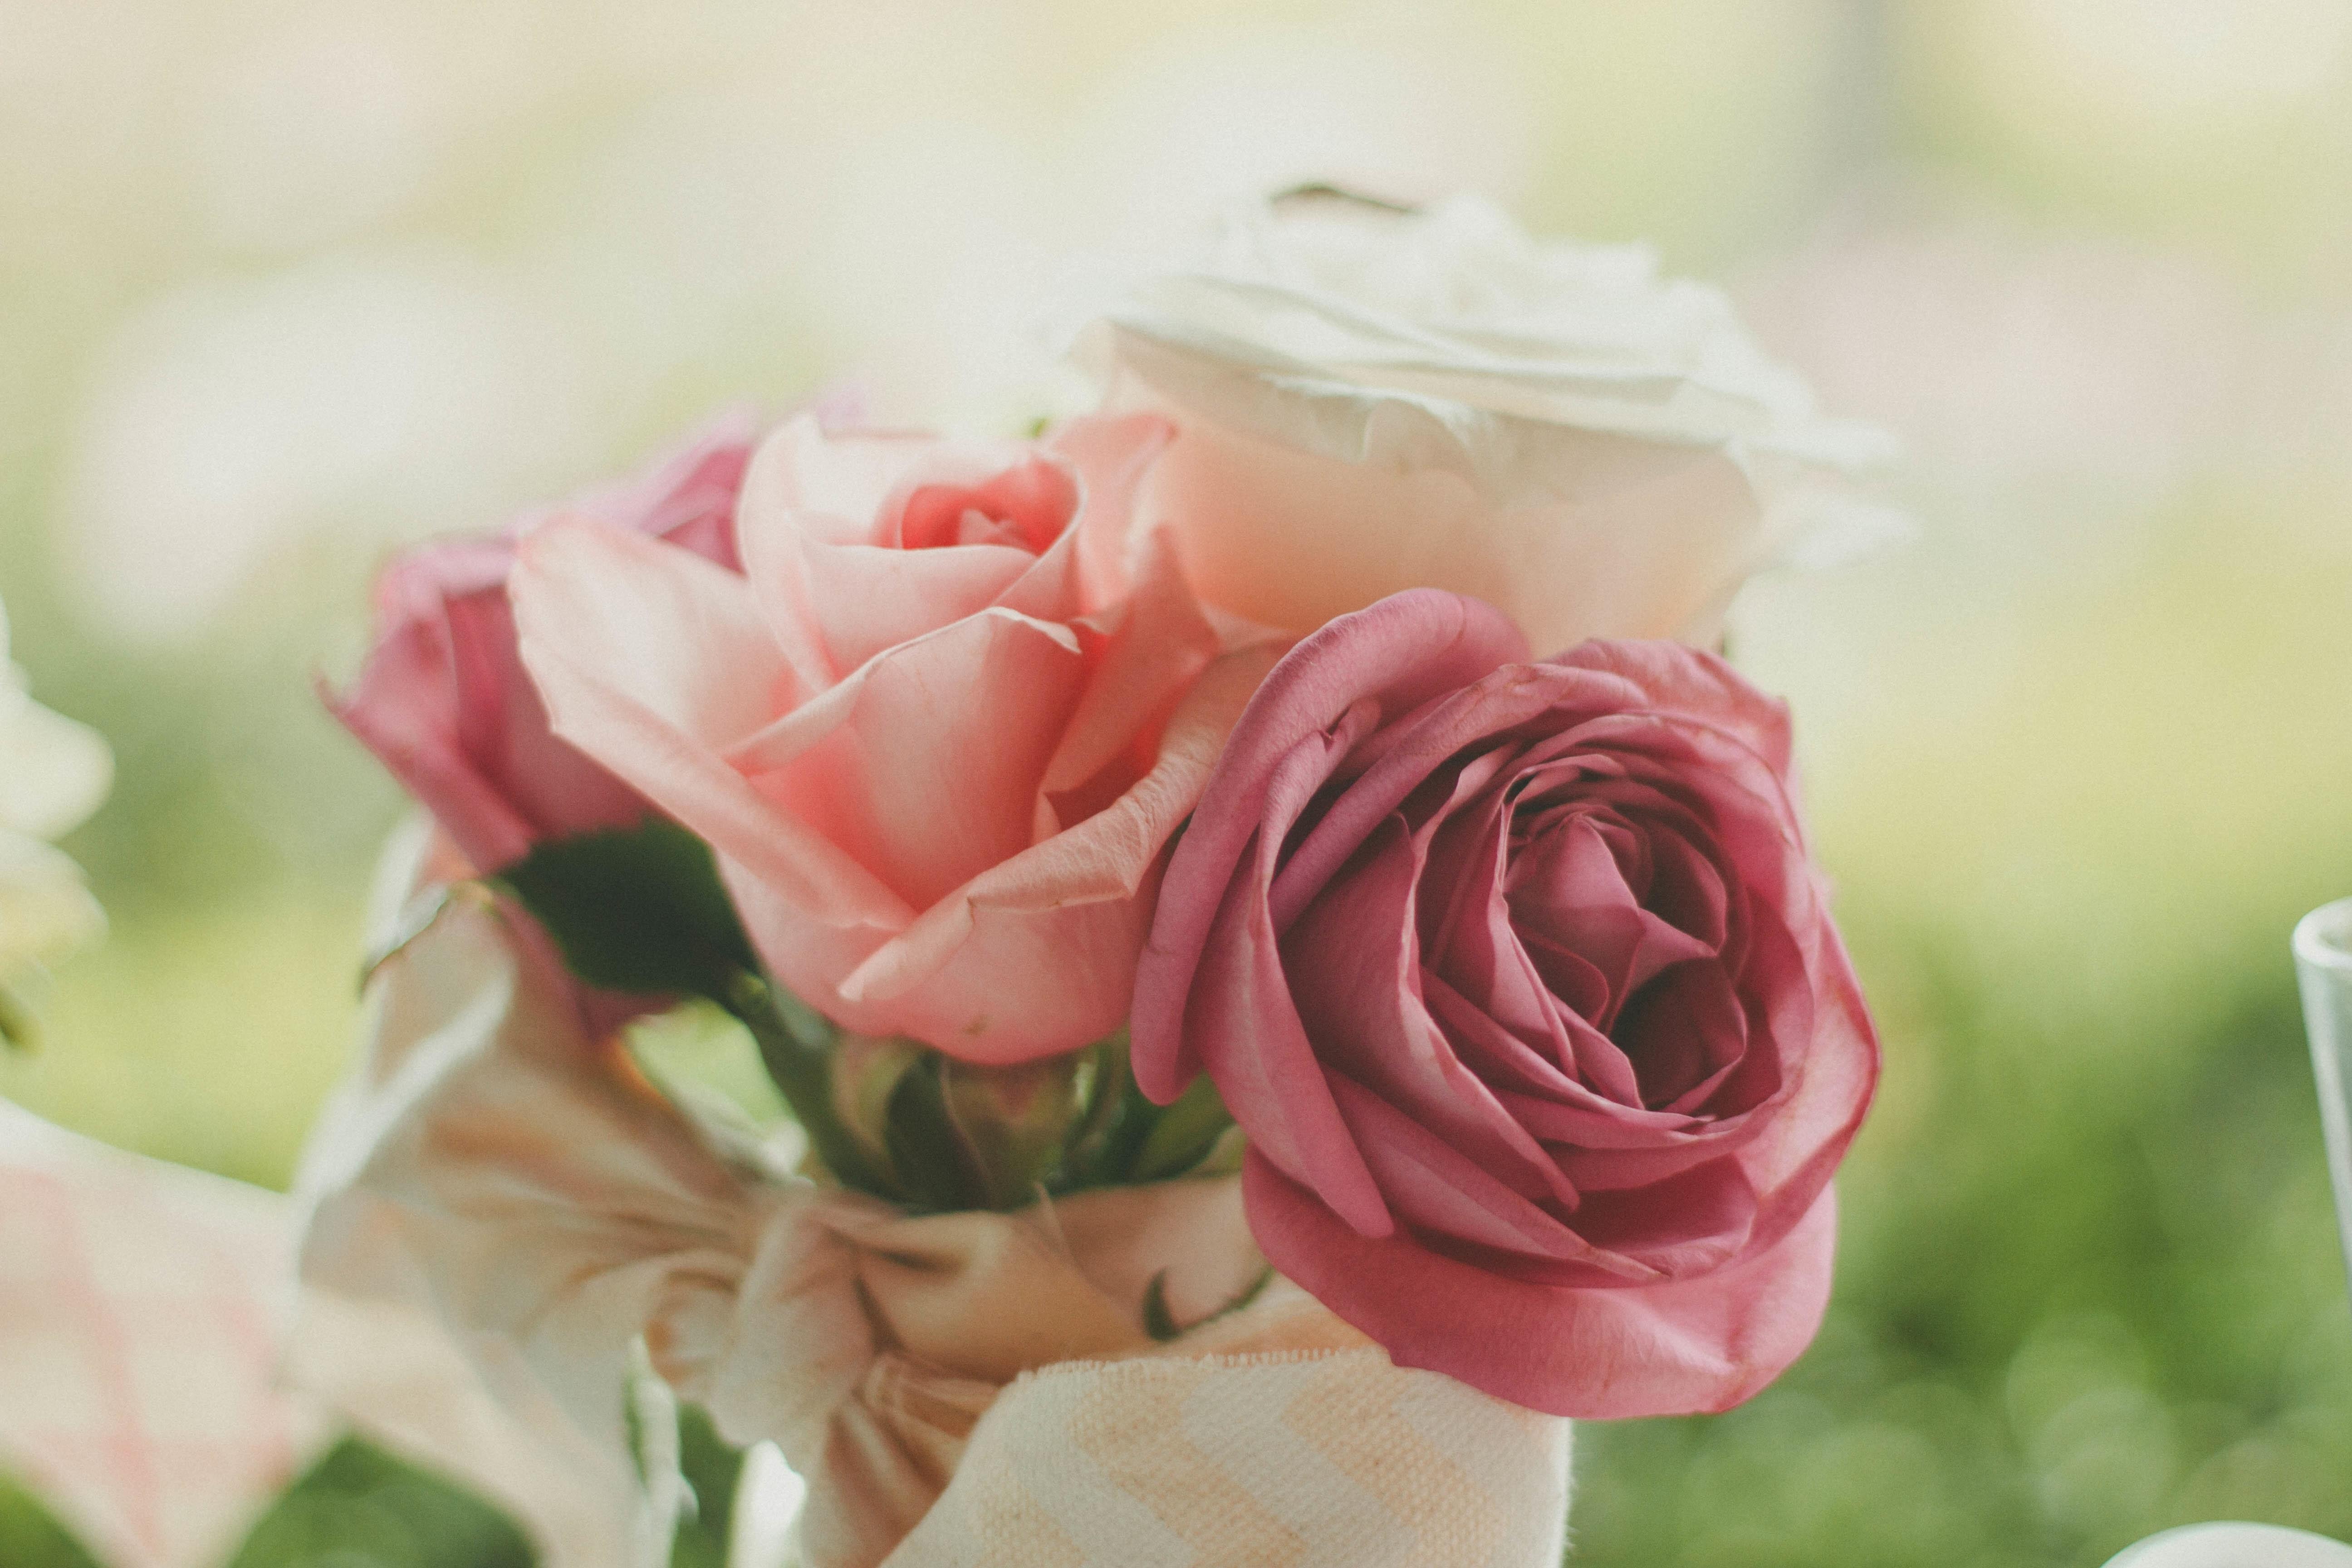 Free Images Blossom Petal Love Romance Romantic Pink Wedding